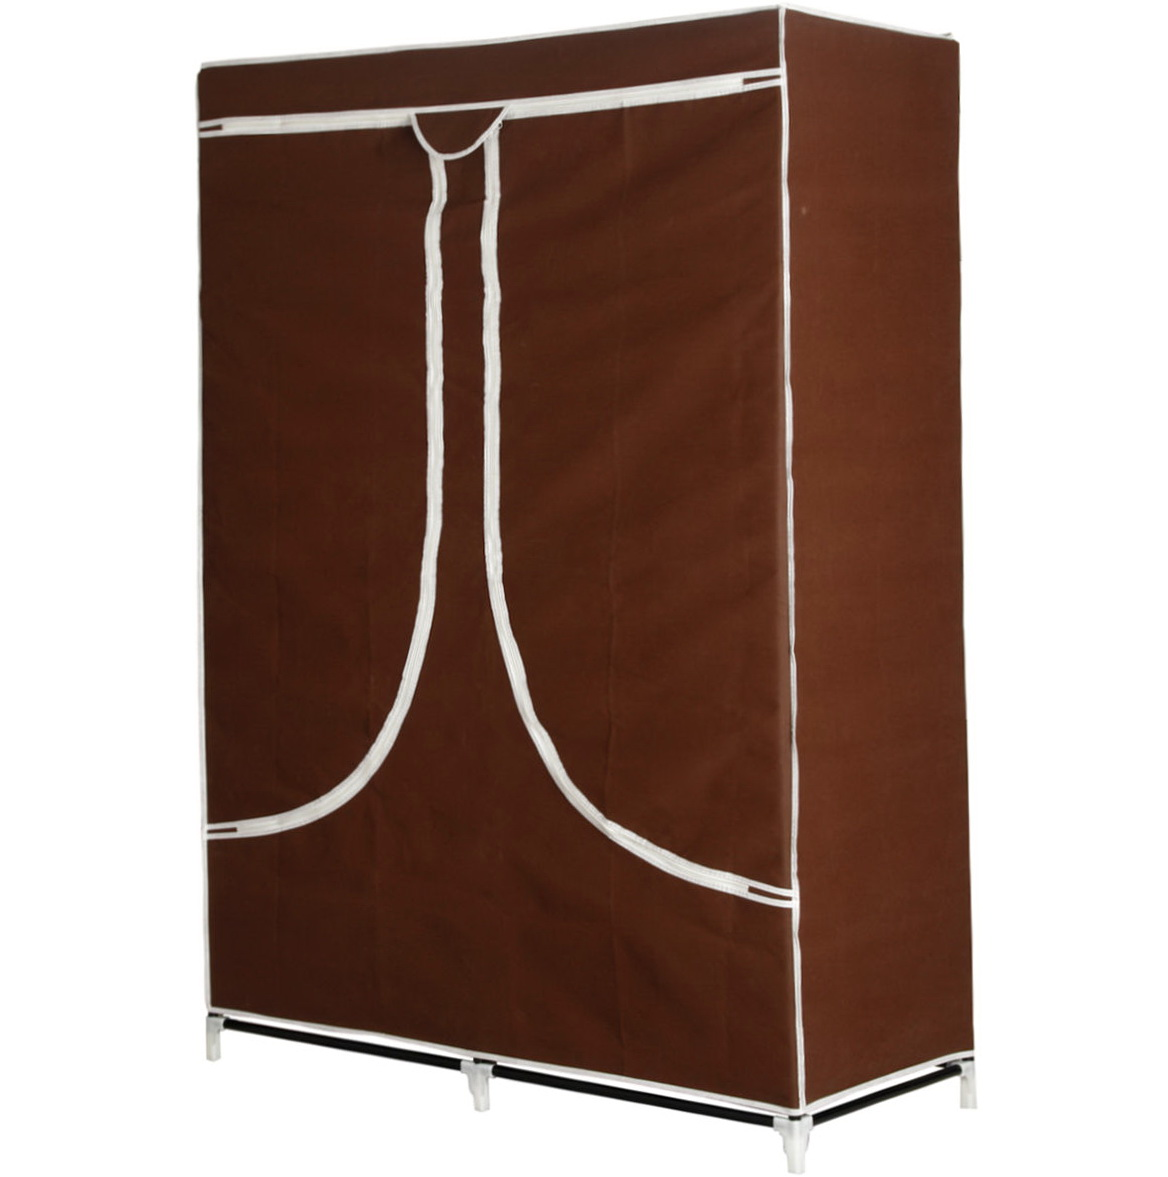 Portable Wardrobe Closet Walmart